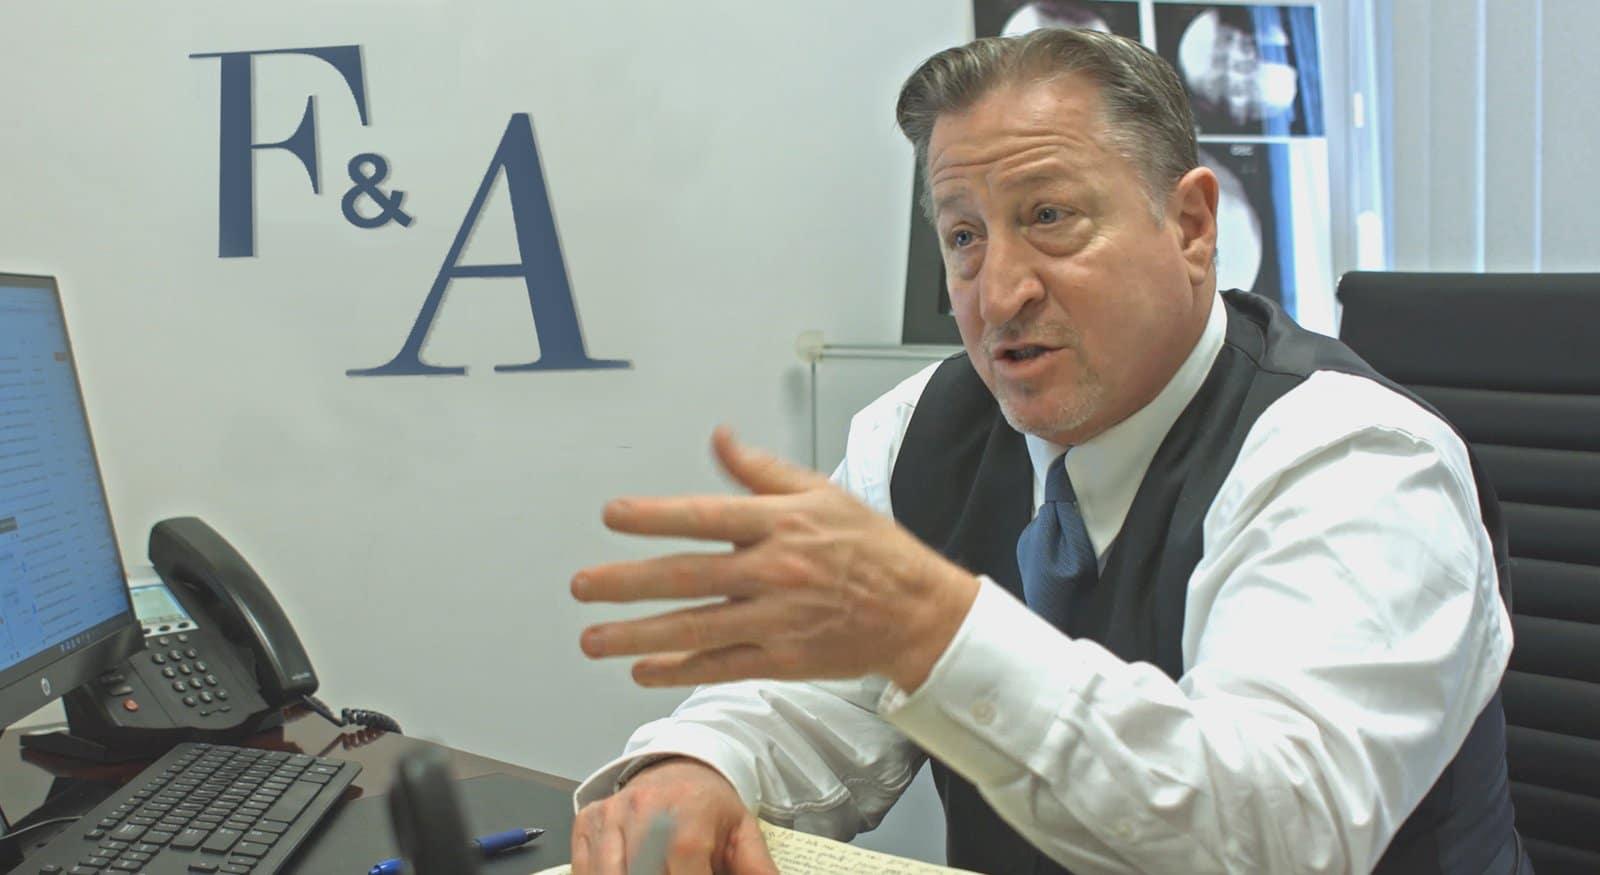 Attorney Richard R. Mogg